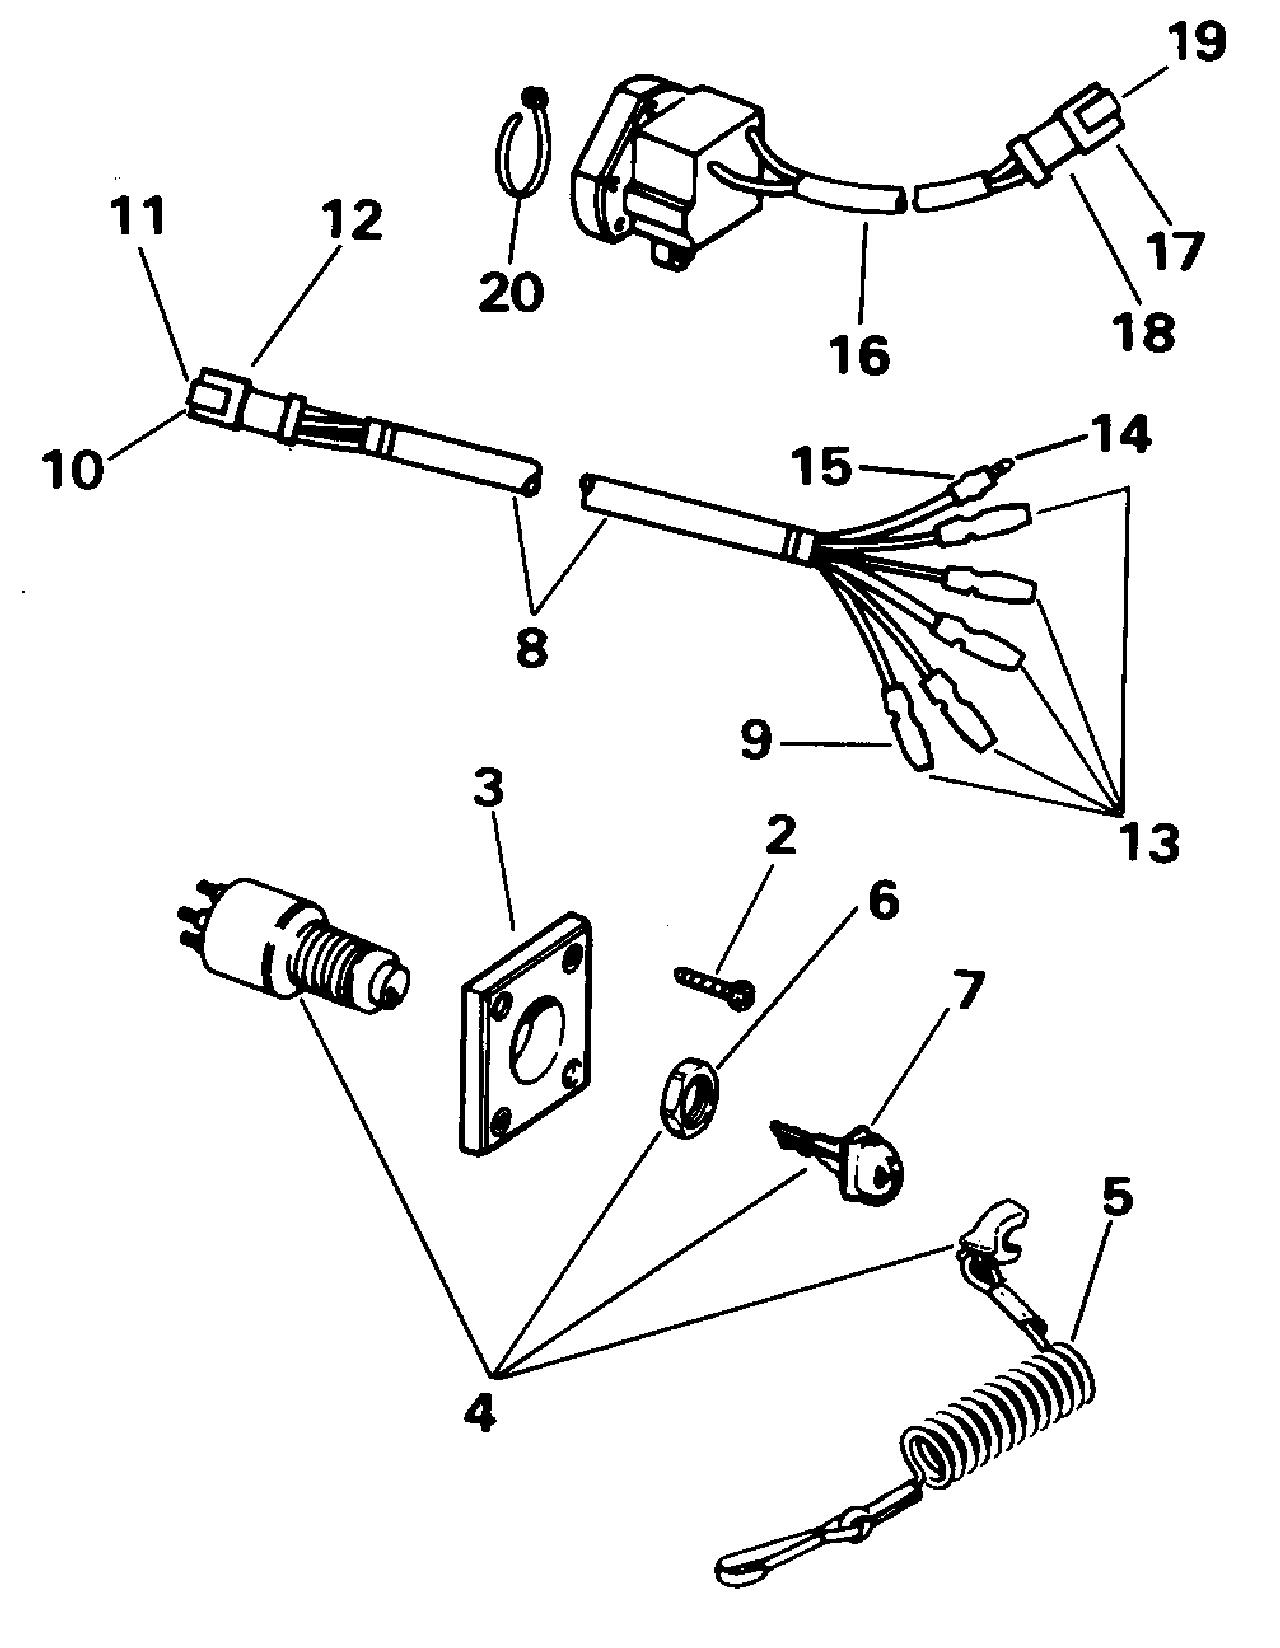 Diagrama Evinrude Johnson 82 84 V4 Notnt